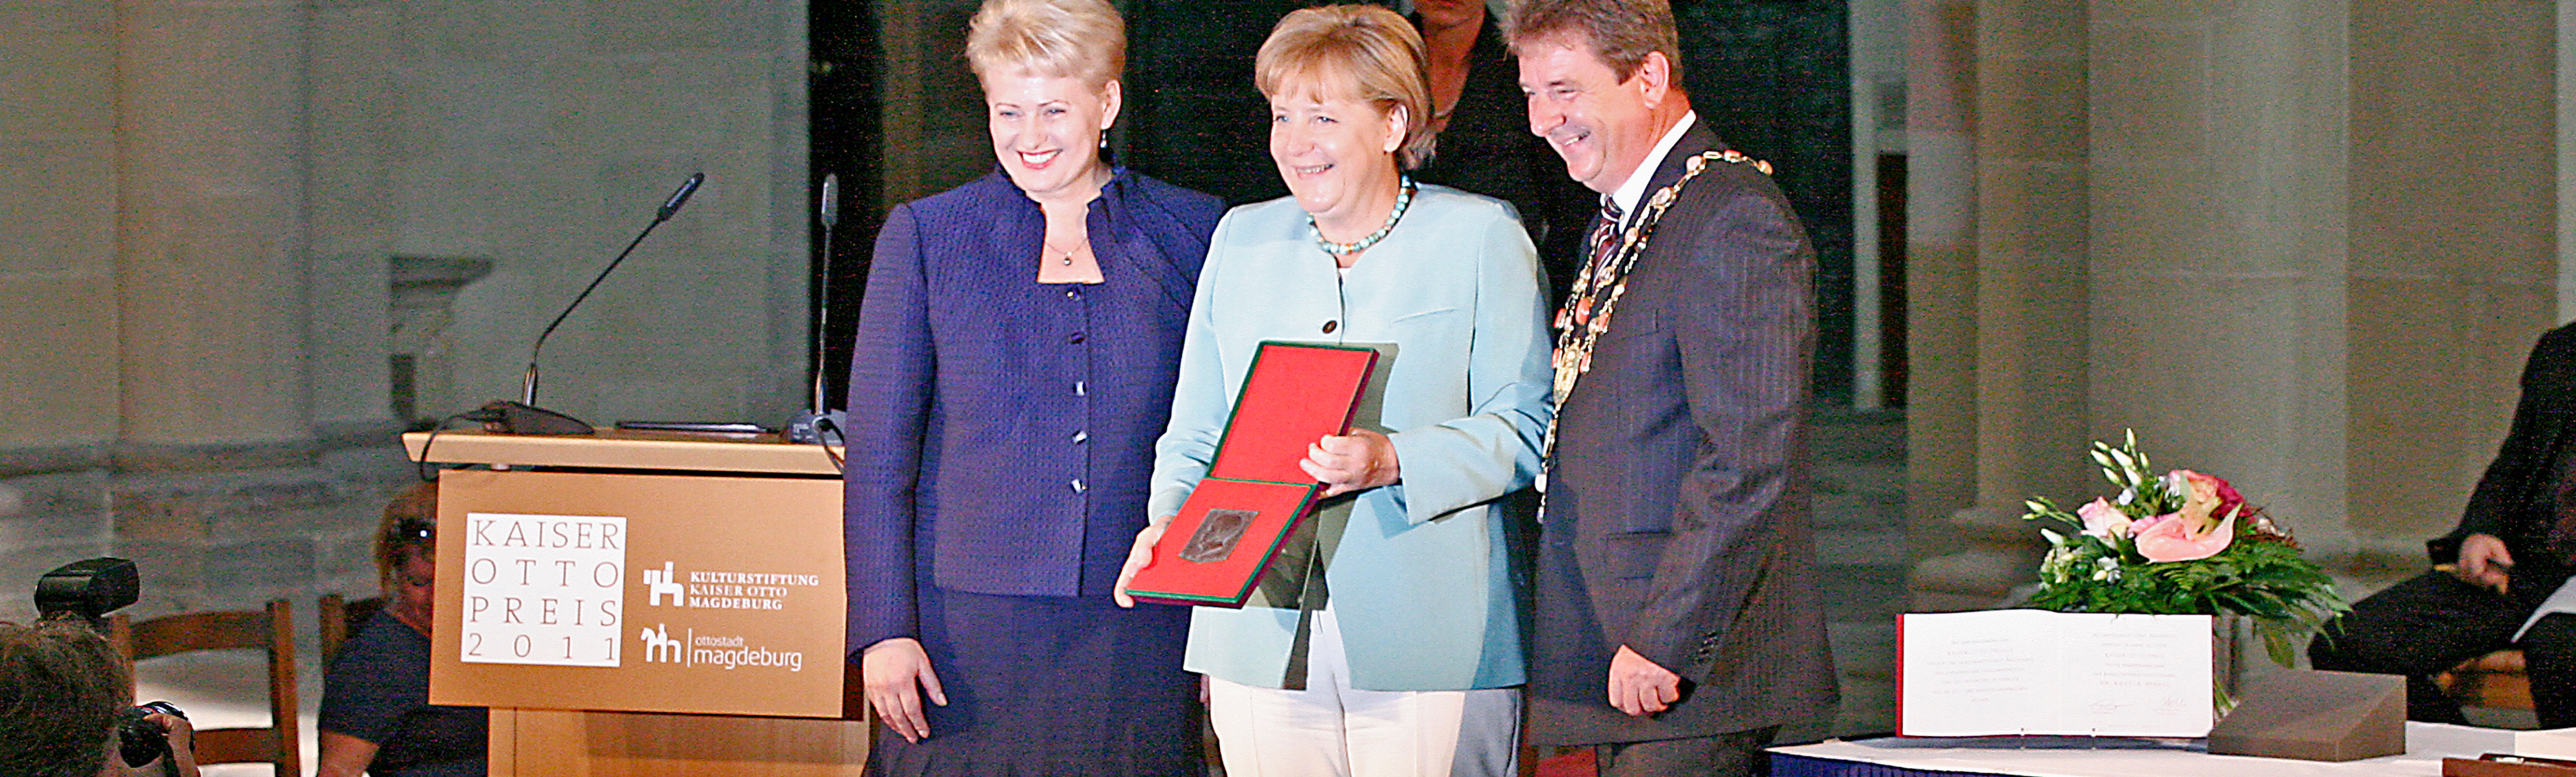 Kaiser Otto Preis - Bundeskanzlerin